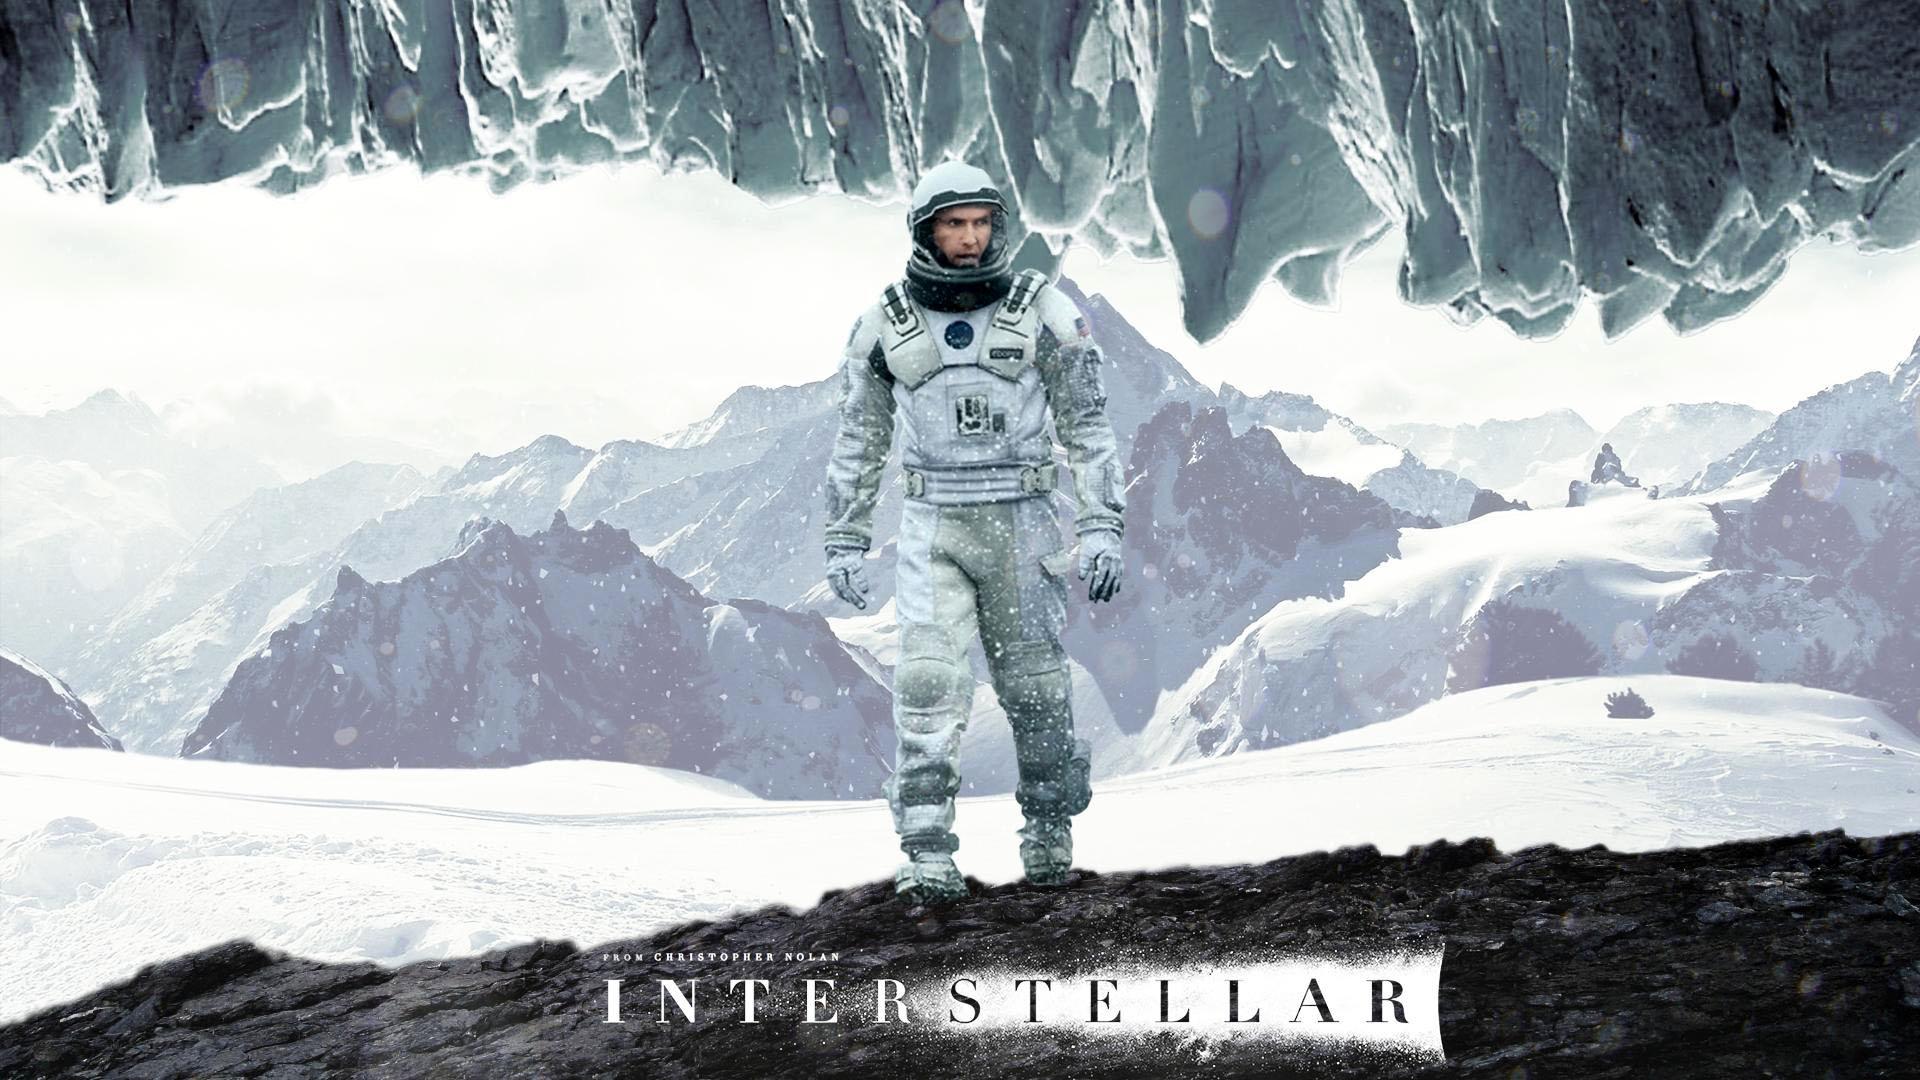 Interstellar (2014) - Photo Gallery - IMDb